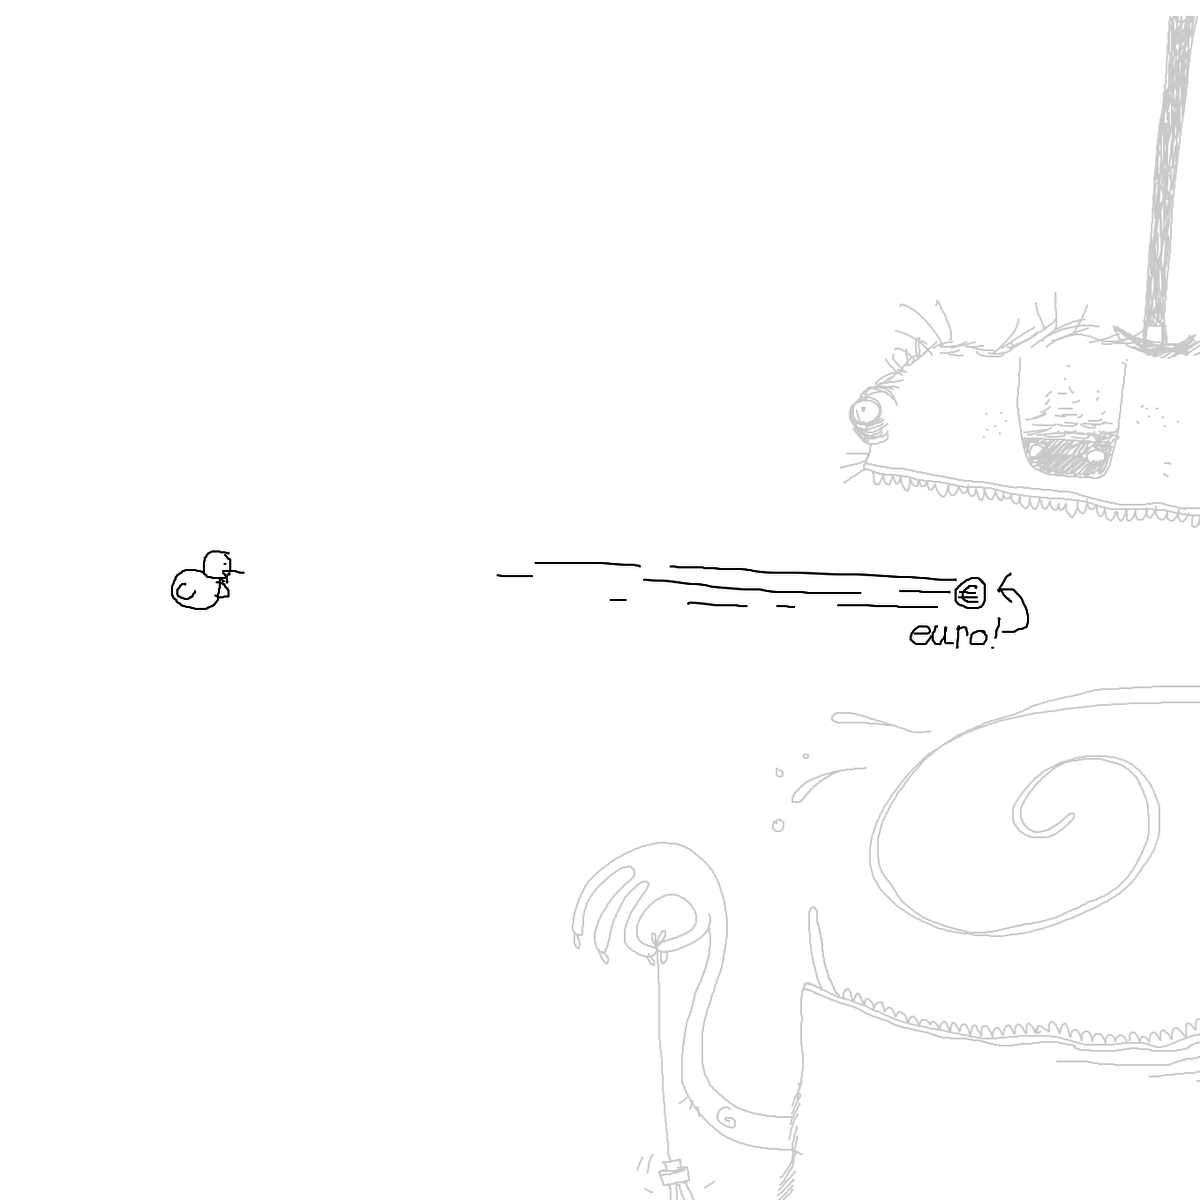 BAAAM drawing#24128 lat:78.4207534790039000lng: -4.4877429008483890